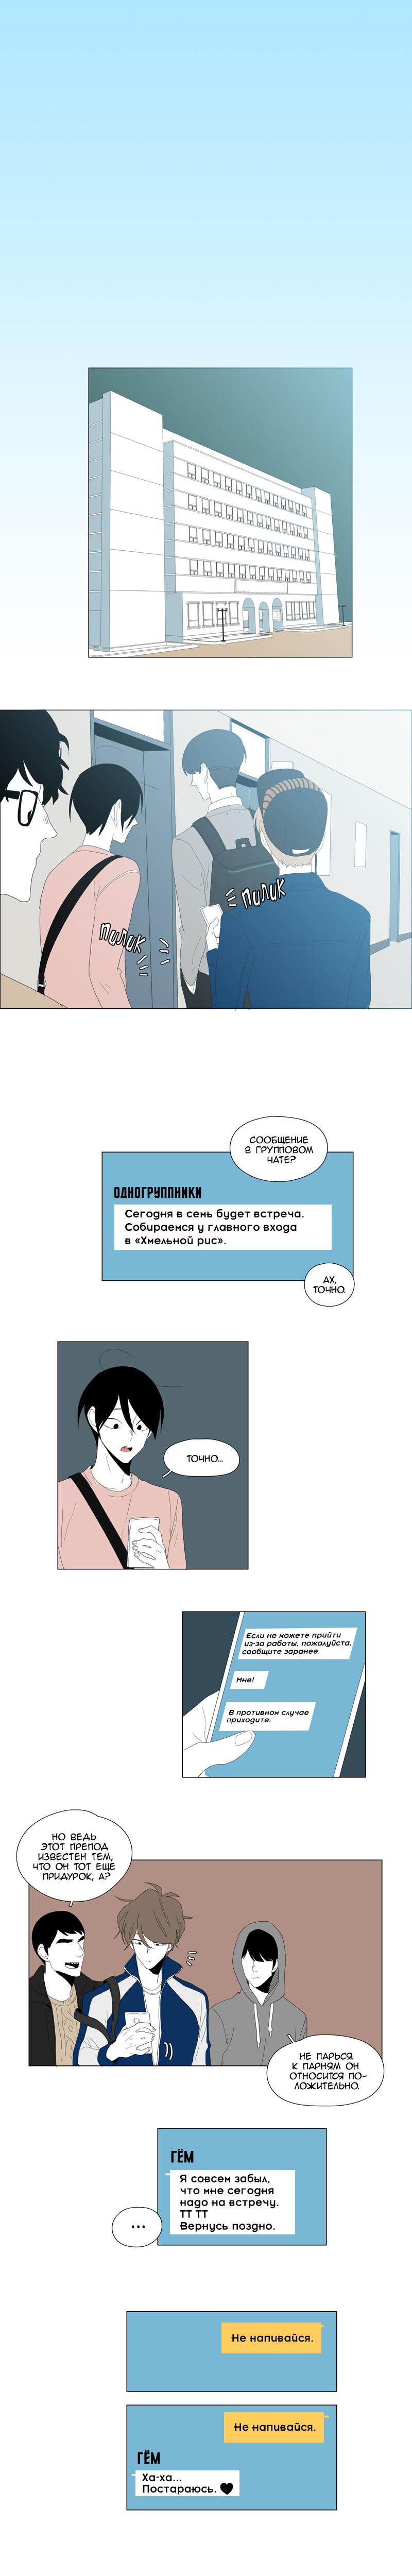 https://r1.ninemanga.com/comics/pic2/33/27873/333362/150471462240.jpg Page 2